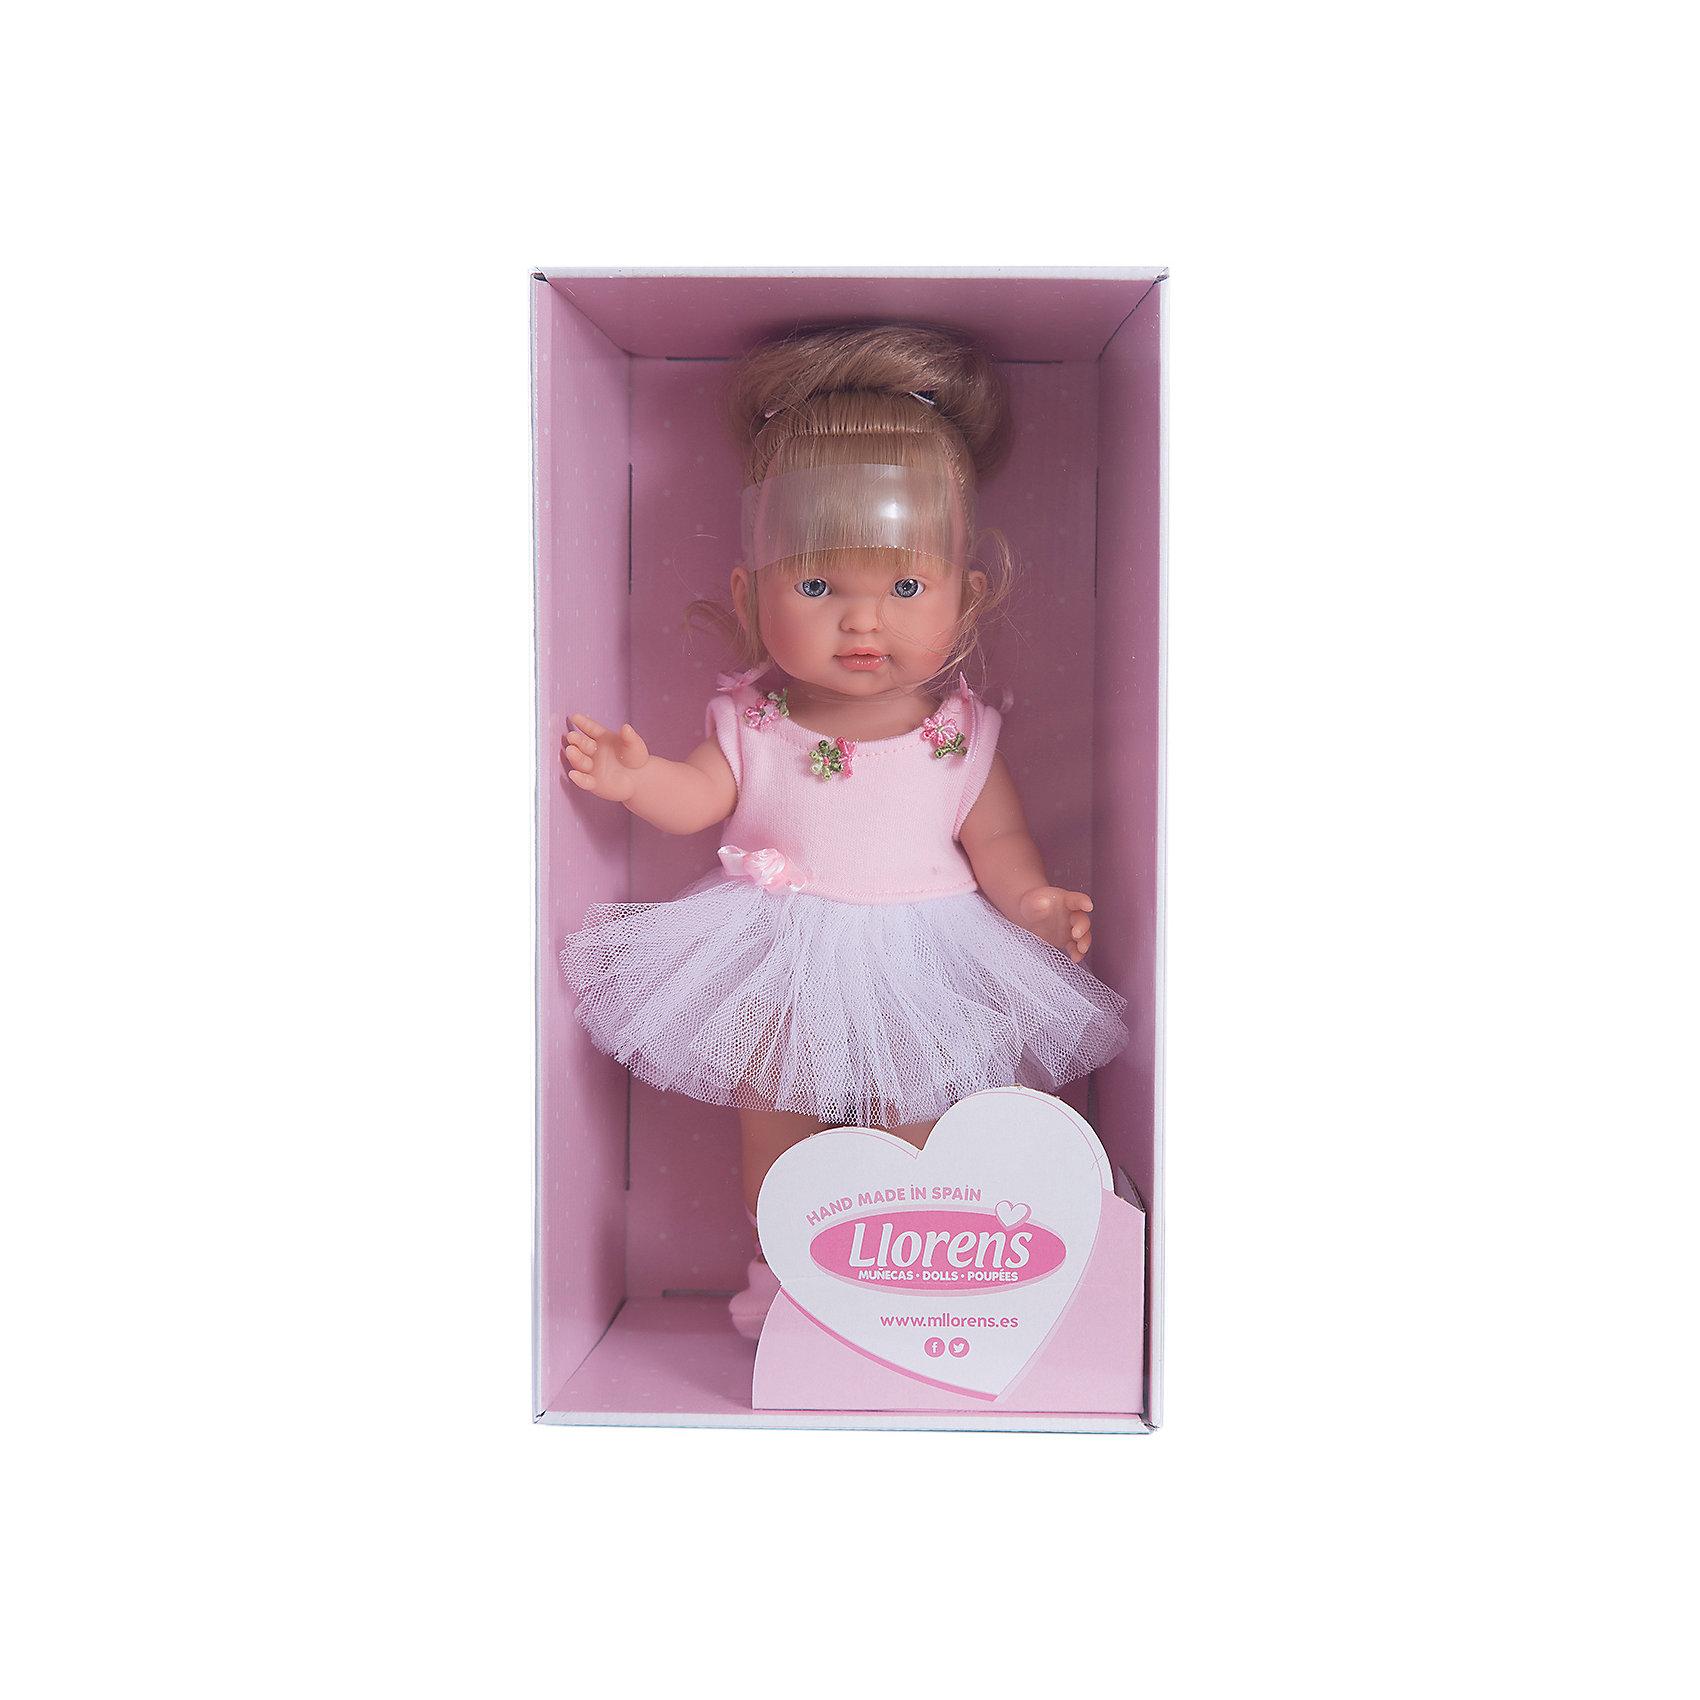 Llorens Кукла Балерина Валерия, 28 см, Llorens куклы и одежда для кукол llorens кукла изабела 33 см со звуком